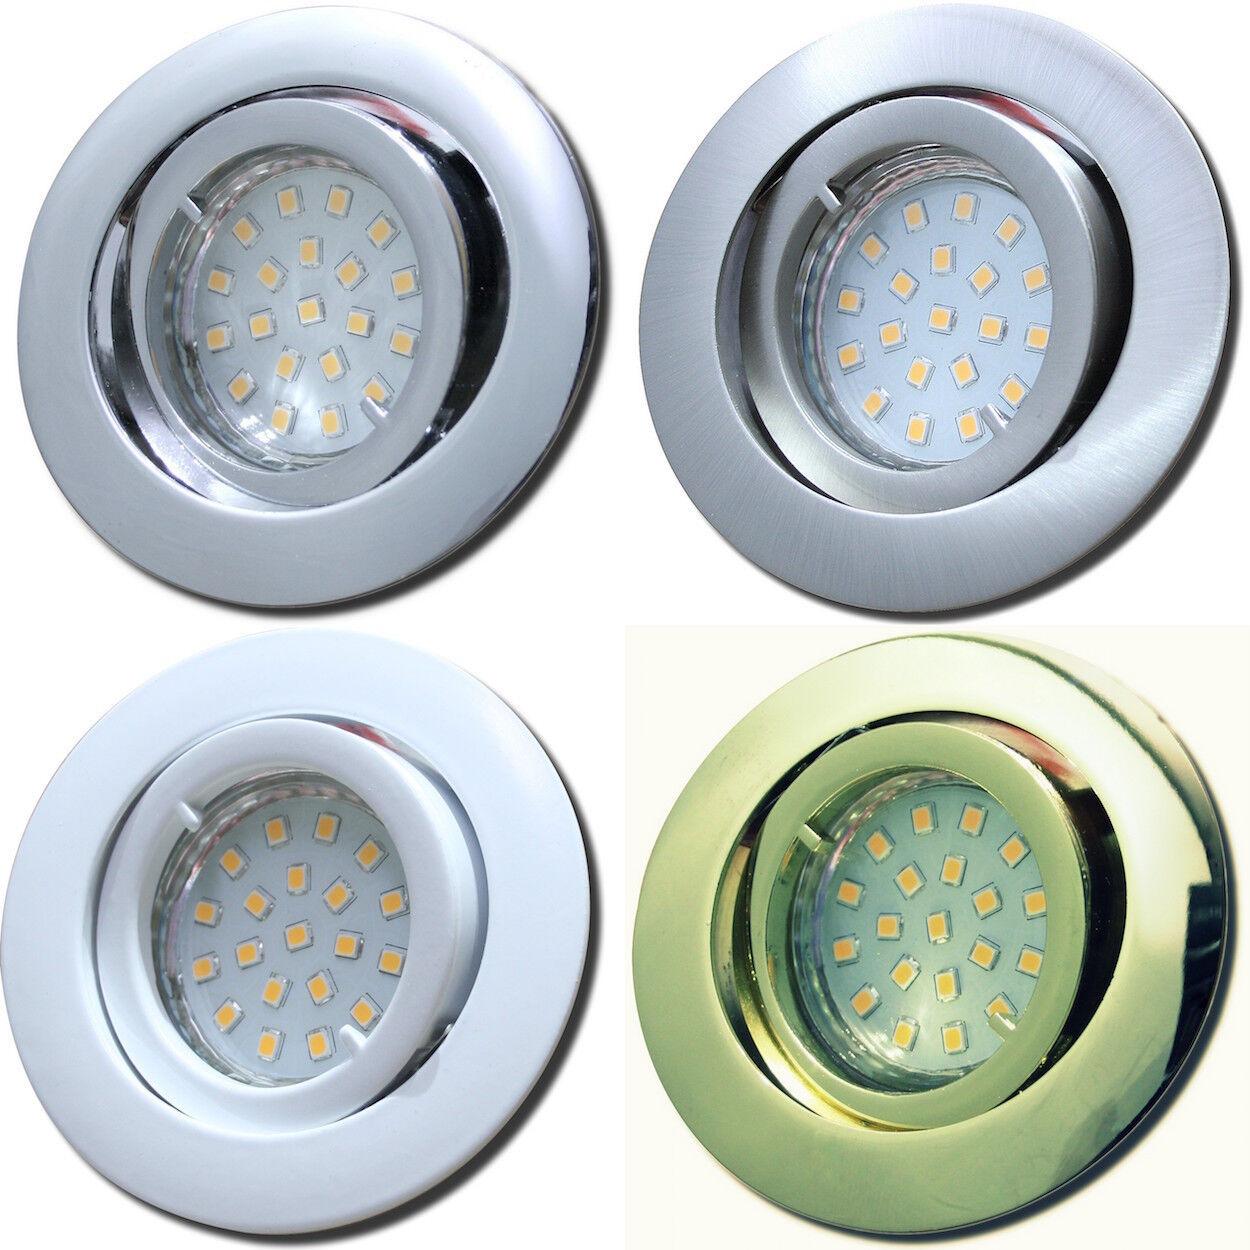 Gu10 Downlight   LED   Einbaustrahler   Wohnraum   Flur   230V   Spots    3Watt